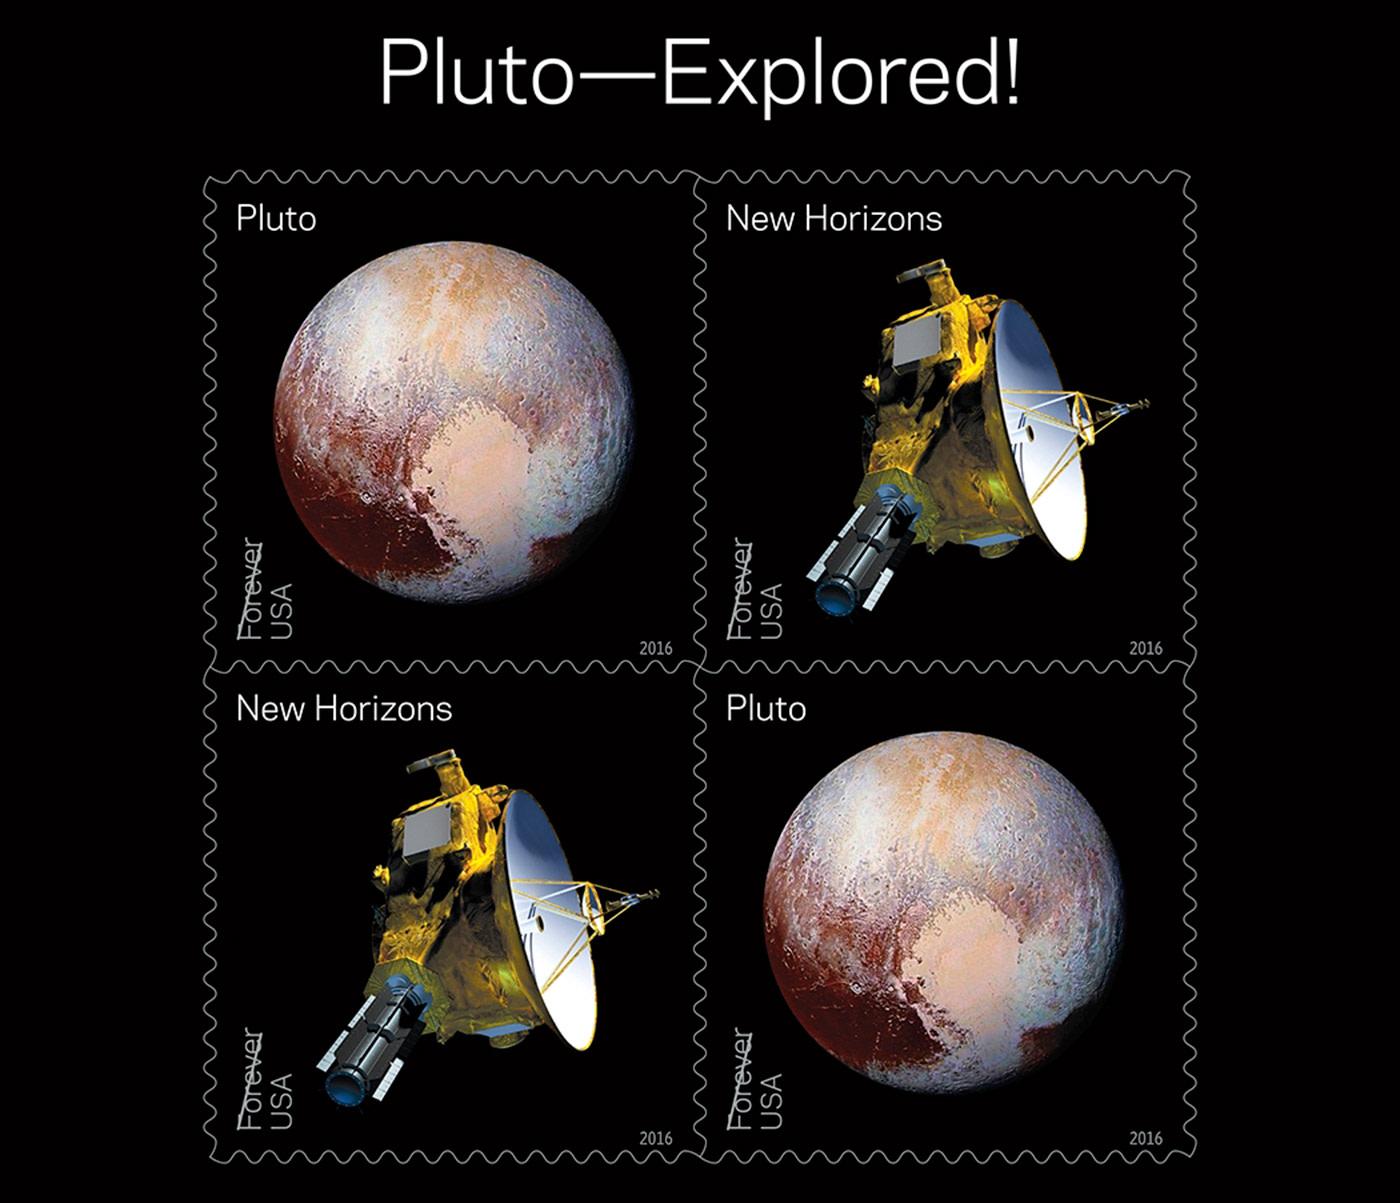 Kerberos Moon Of Plluto: USPS' 2016 Stamps Celebrate Pluto's Exploration